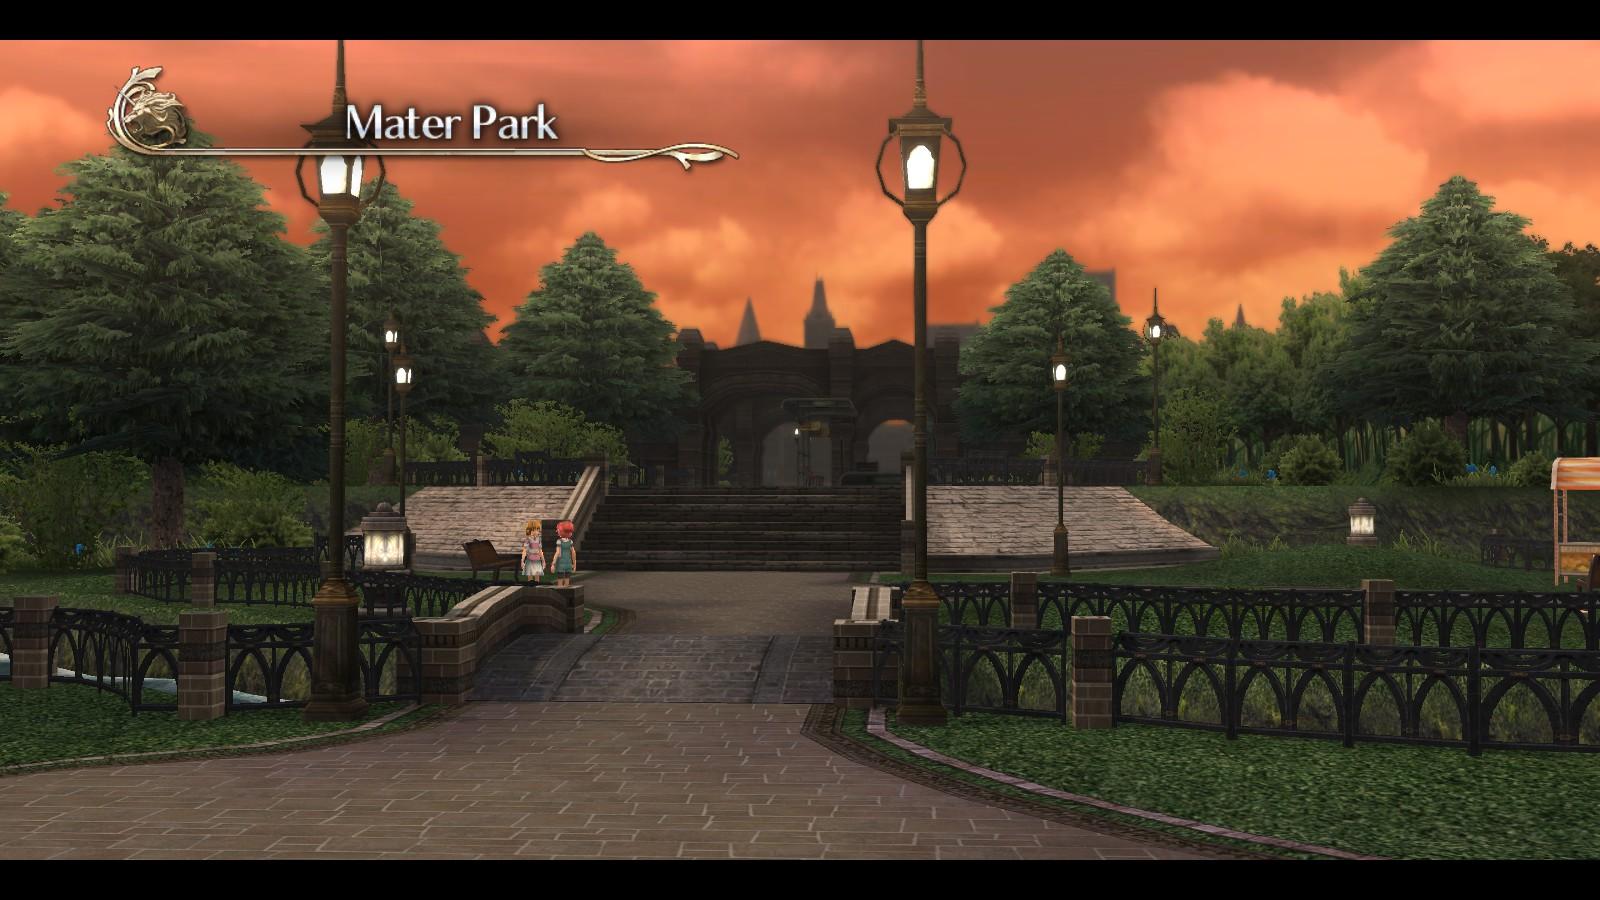 Heimdallr/Mater Park